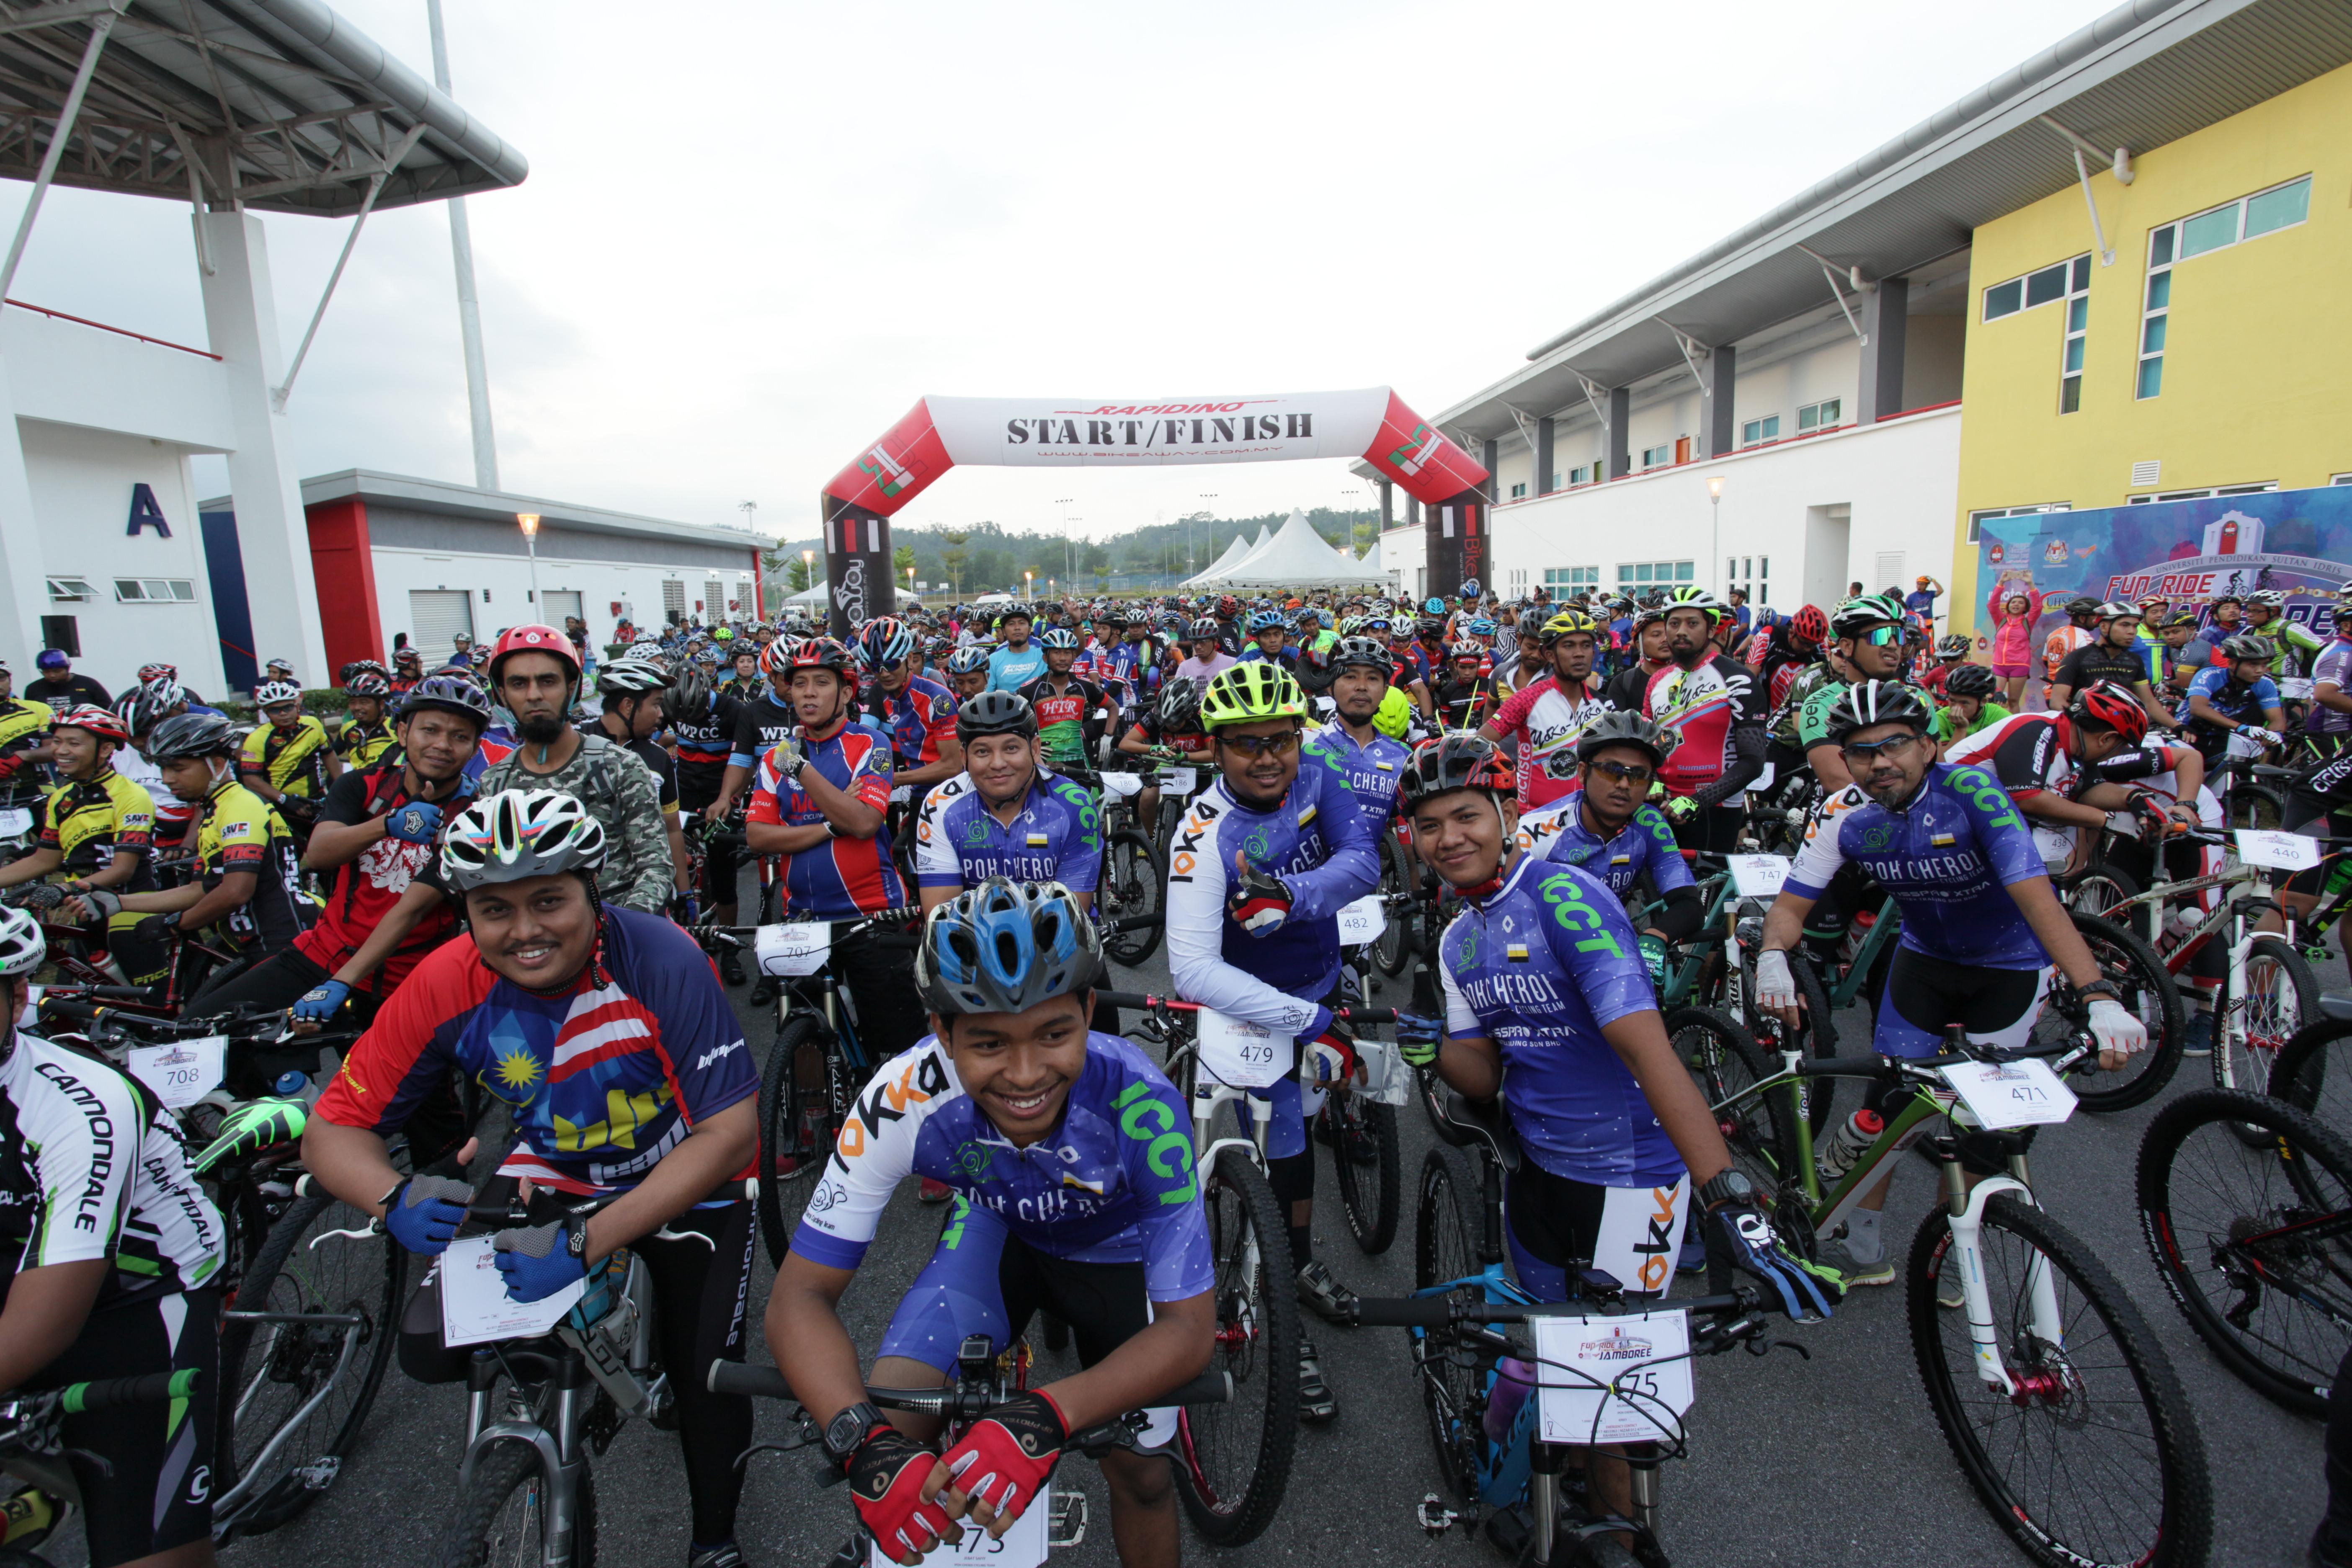 1142 sertai UPSI Fun Ride Jamboree 2016